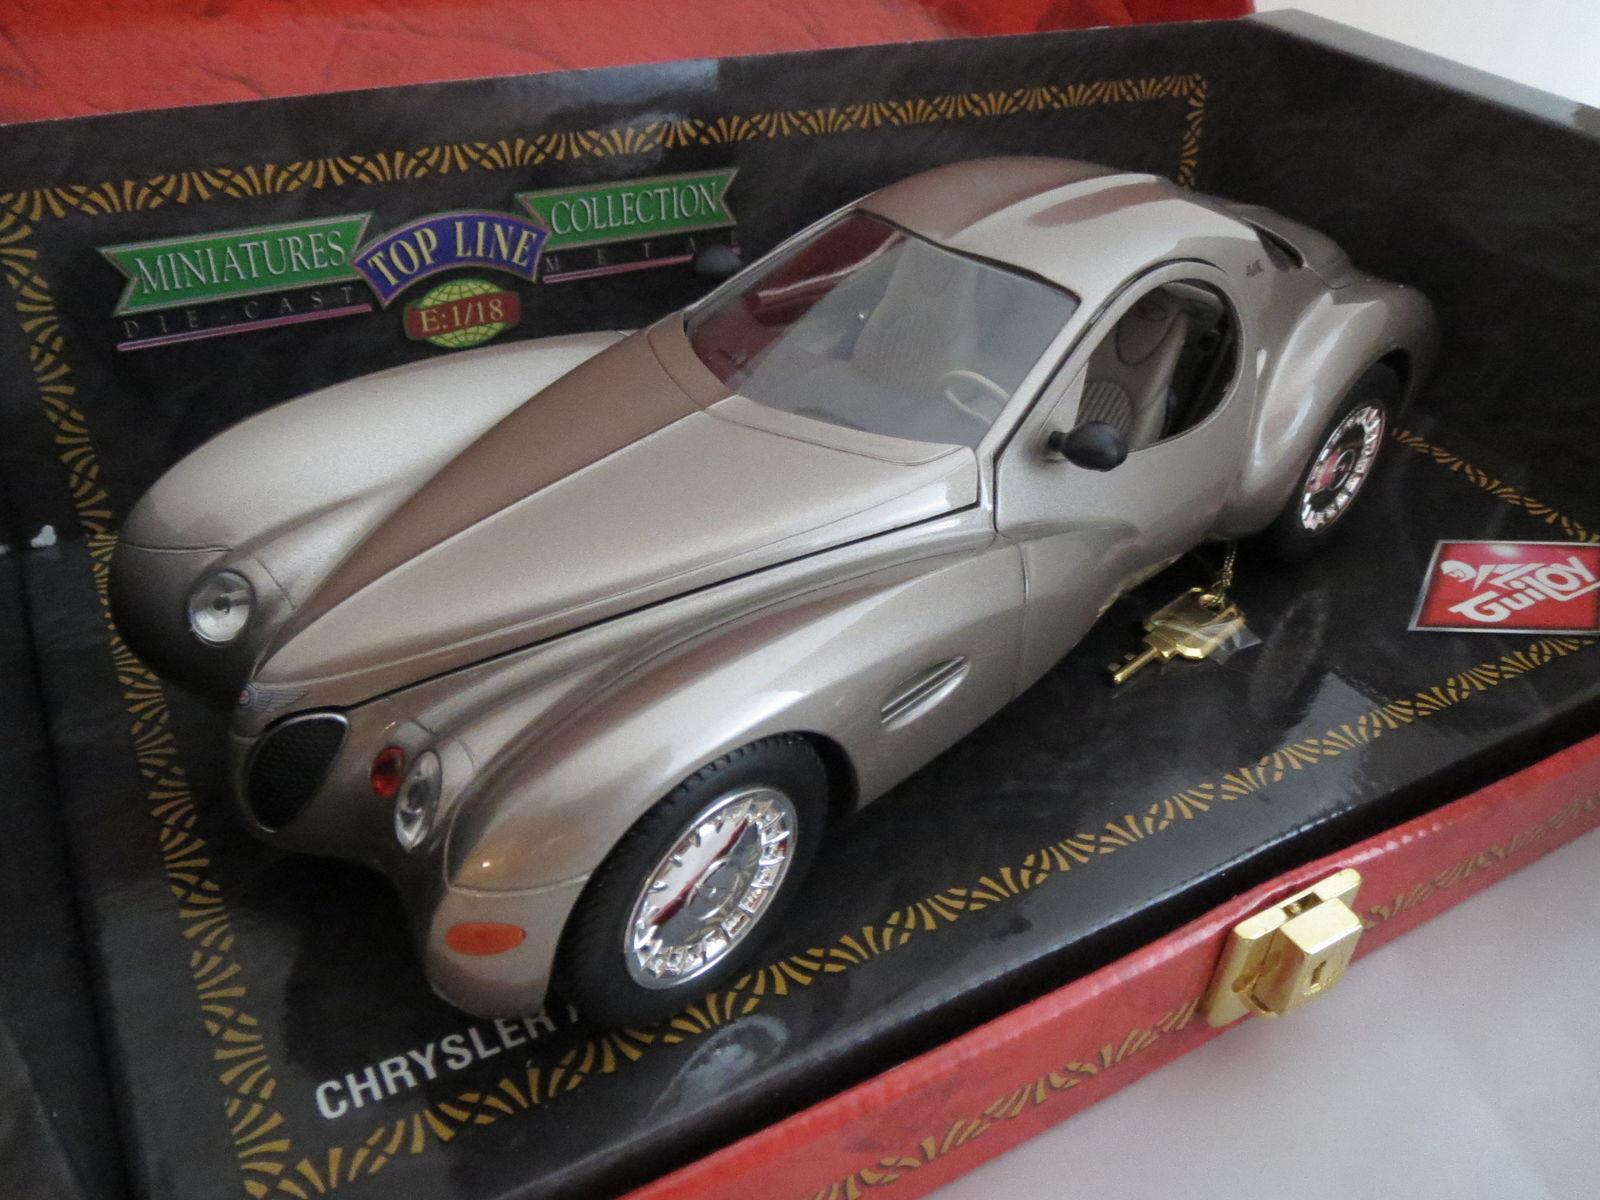 Chrysler ATLANTIC, broncemetallic, tout pour ouvrir, 1 18, GUILOY environ 1074 grammes